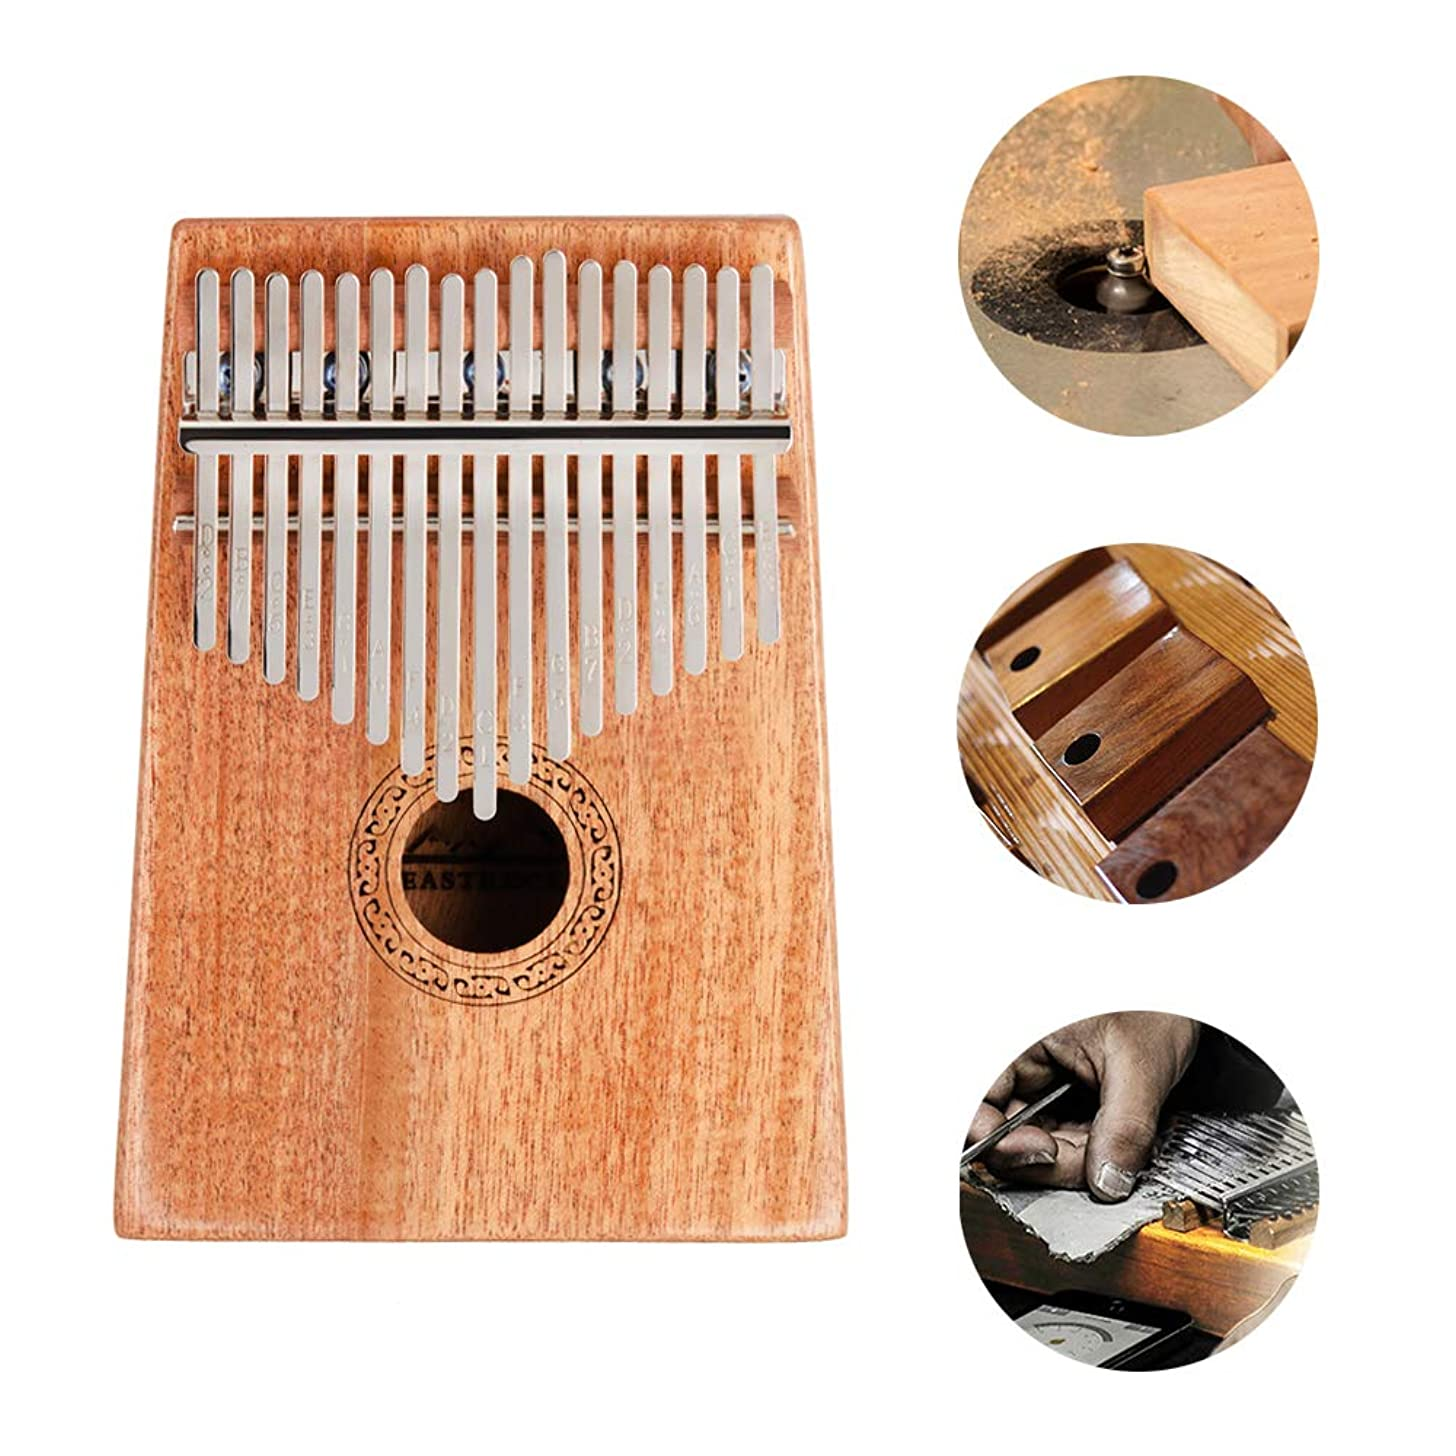 EastRock Kalimba 17 Keys Thumb Piano for Kids Mahogany Body Portable Mbira Finger Piano with Study Instruction and Tune Hammer for Beginners